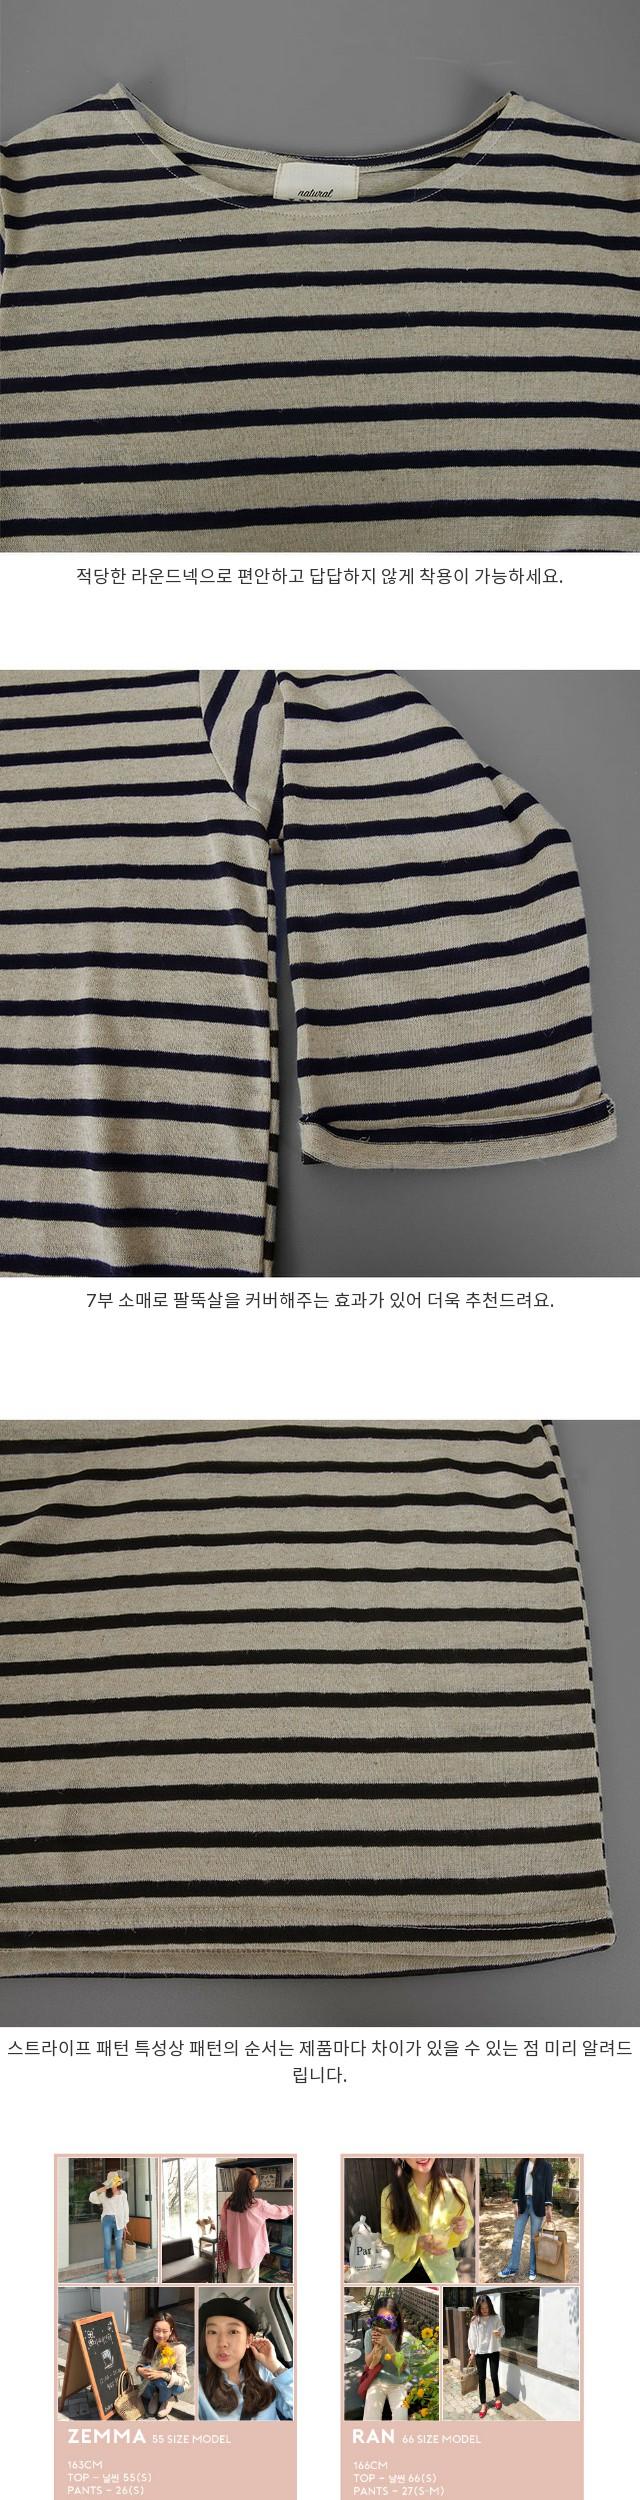 Sailor series (ver. Organic linen)